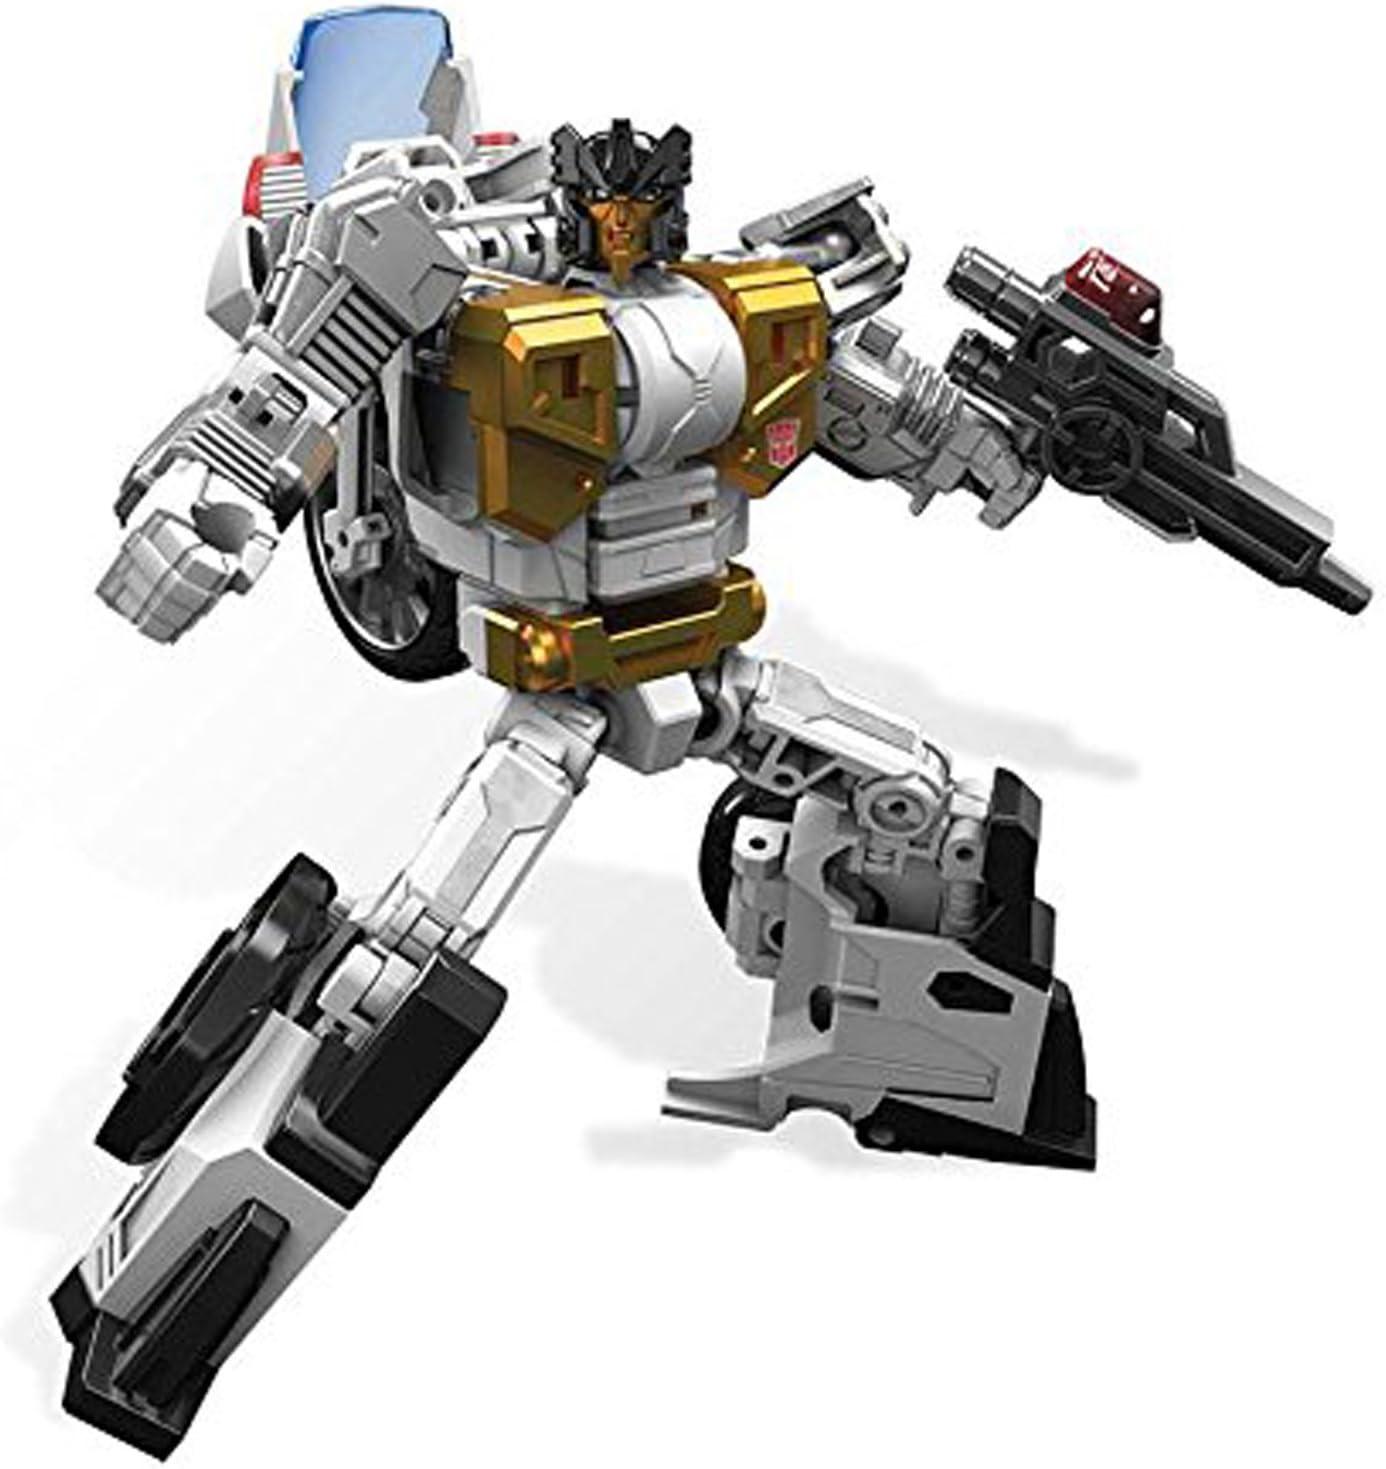 Transformers G1 Protectobot Blades Left Gun 1986 Original Part